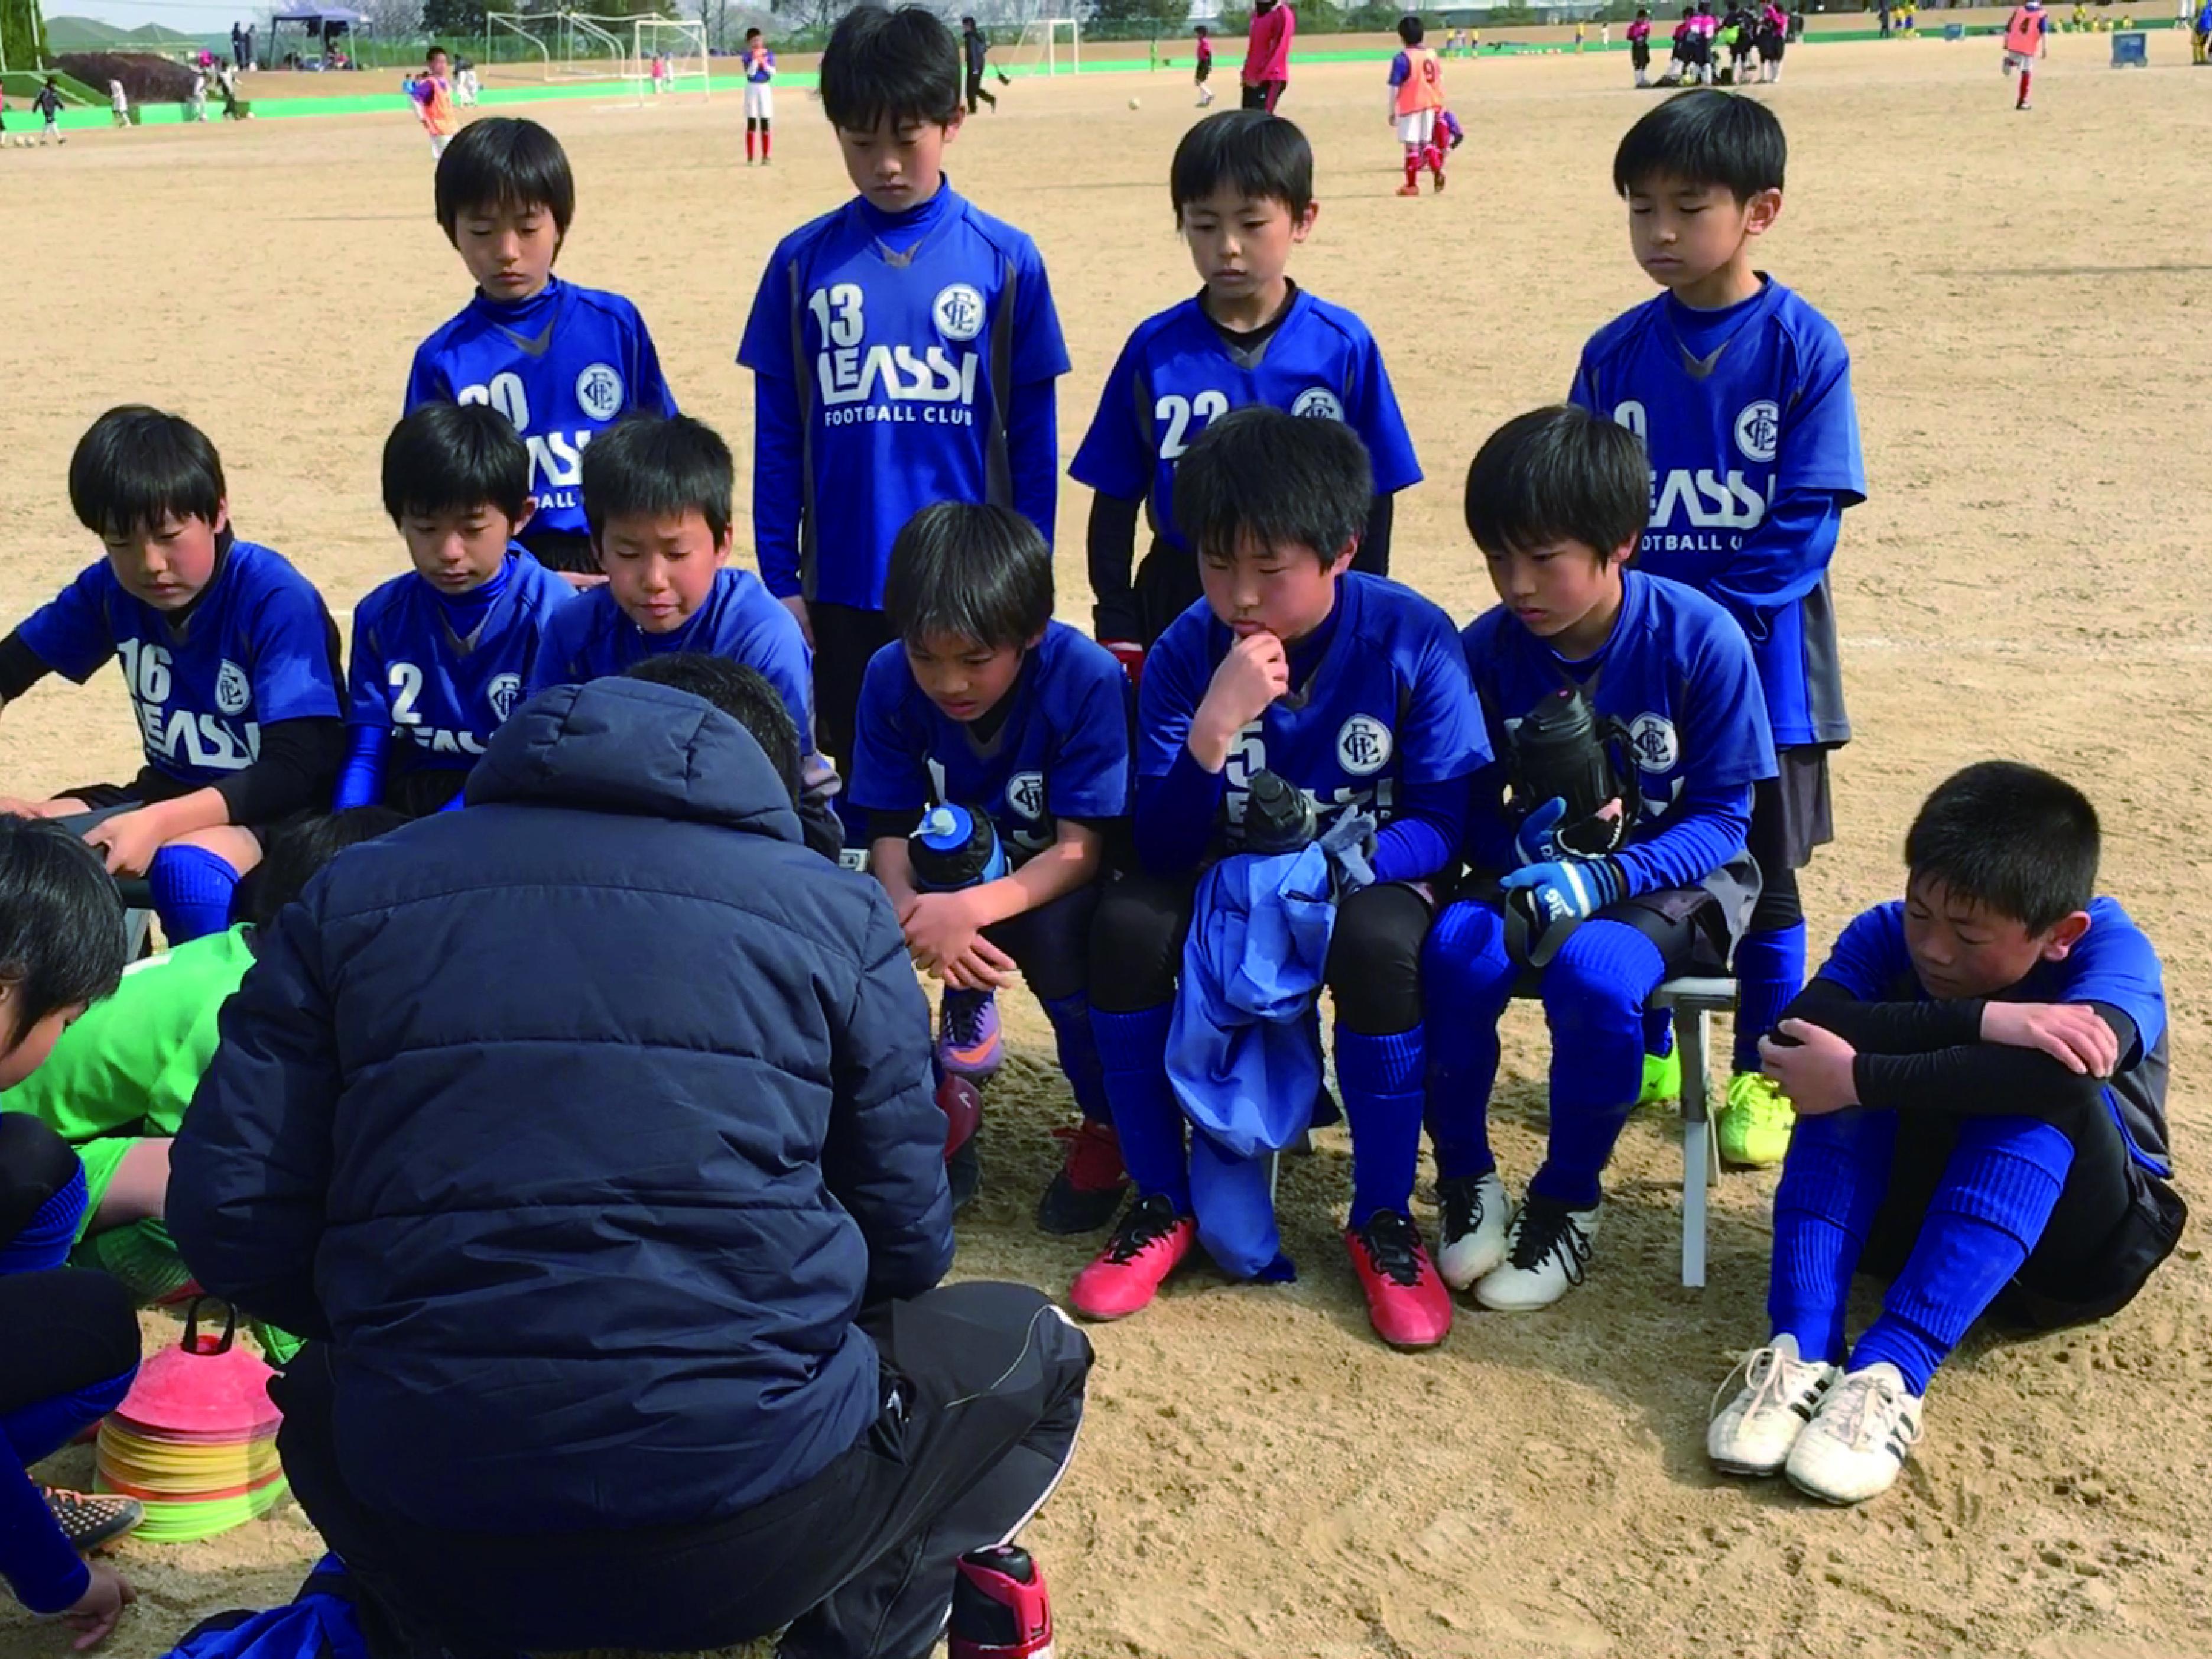 U-10(小学4年生)TRM 西南•田村•龍南 チャンピオンシップへ向けて